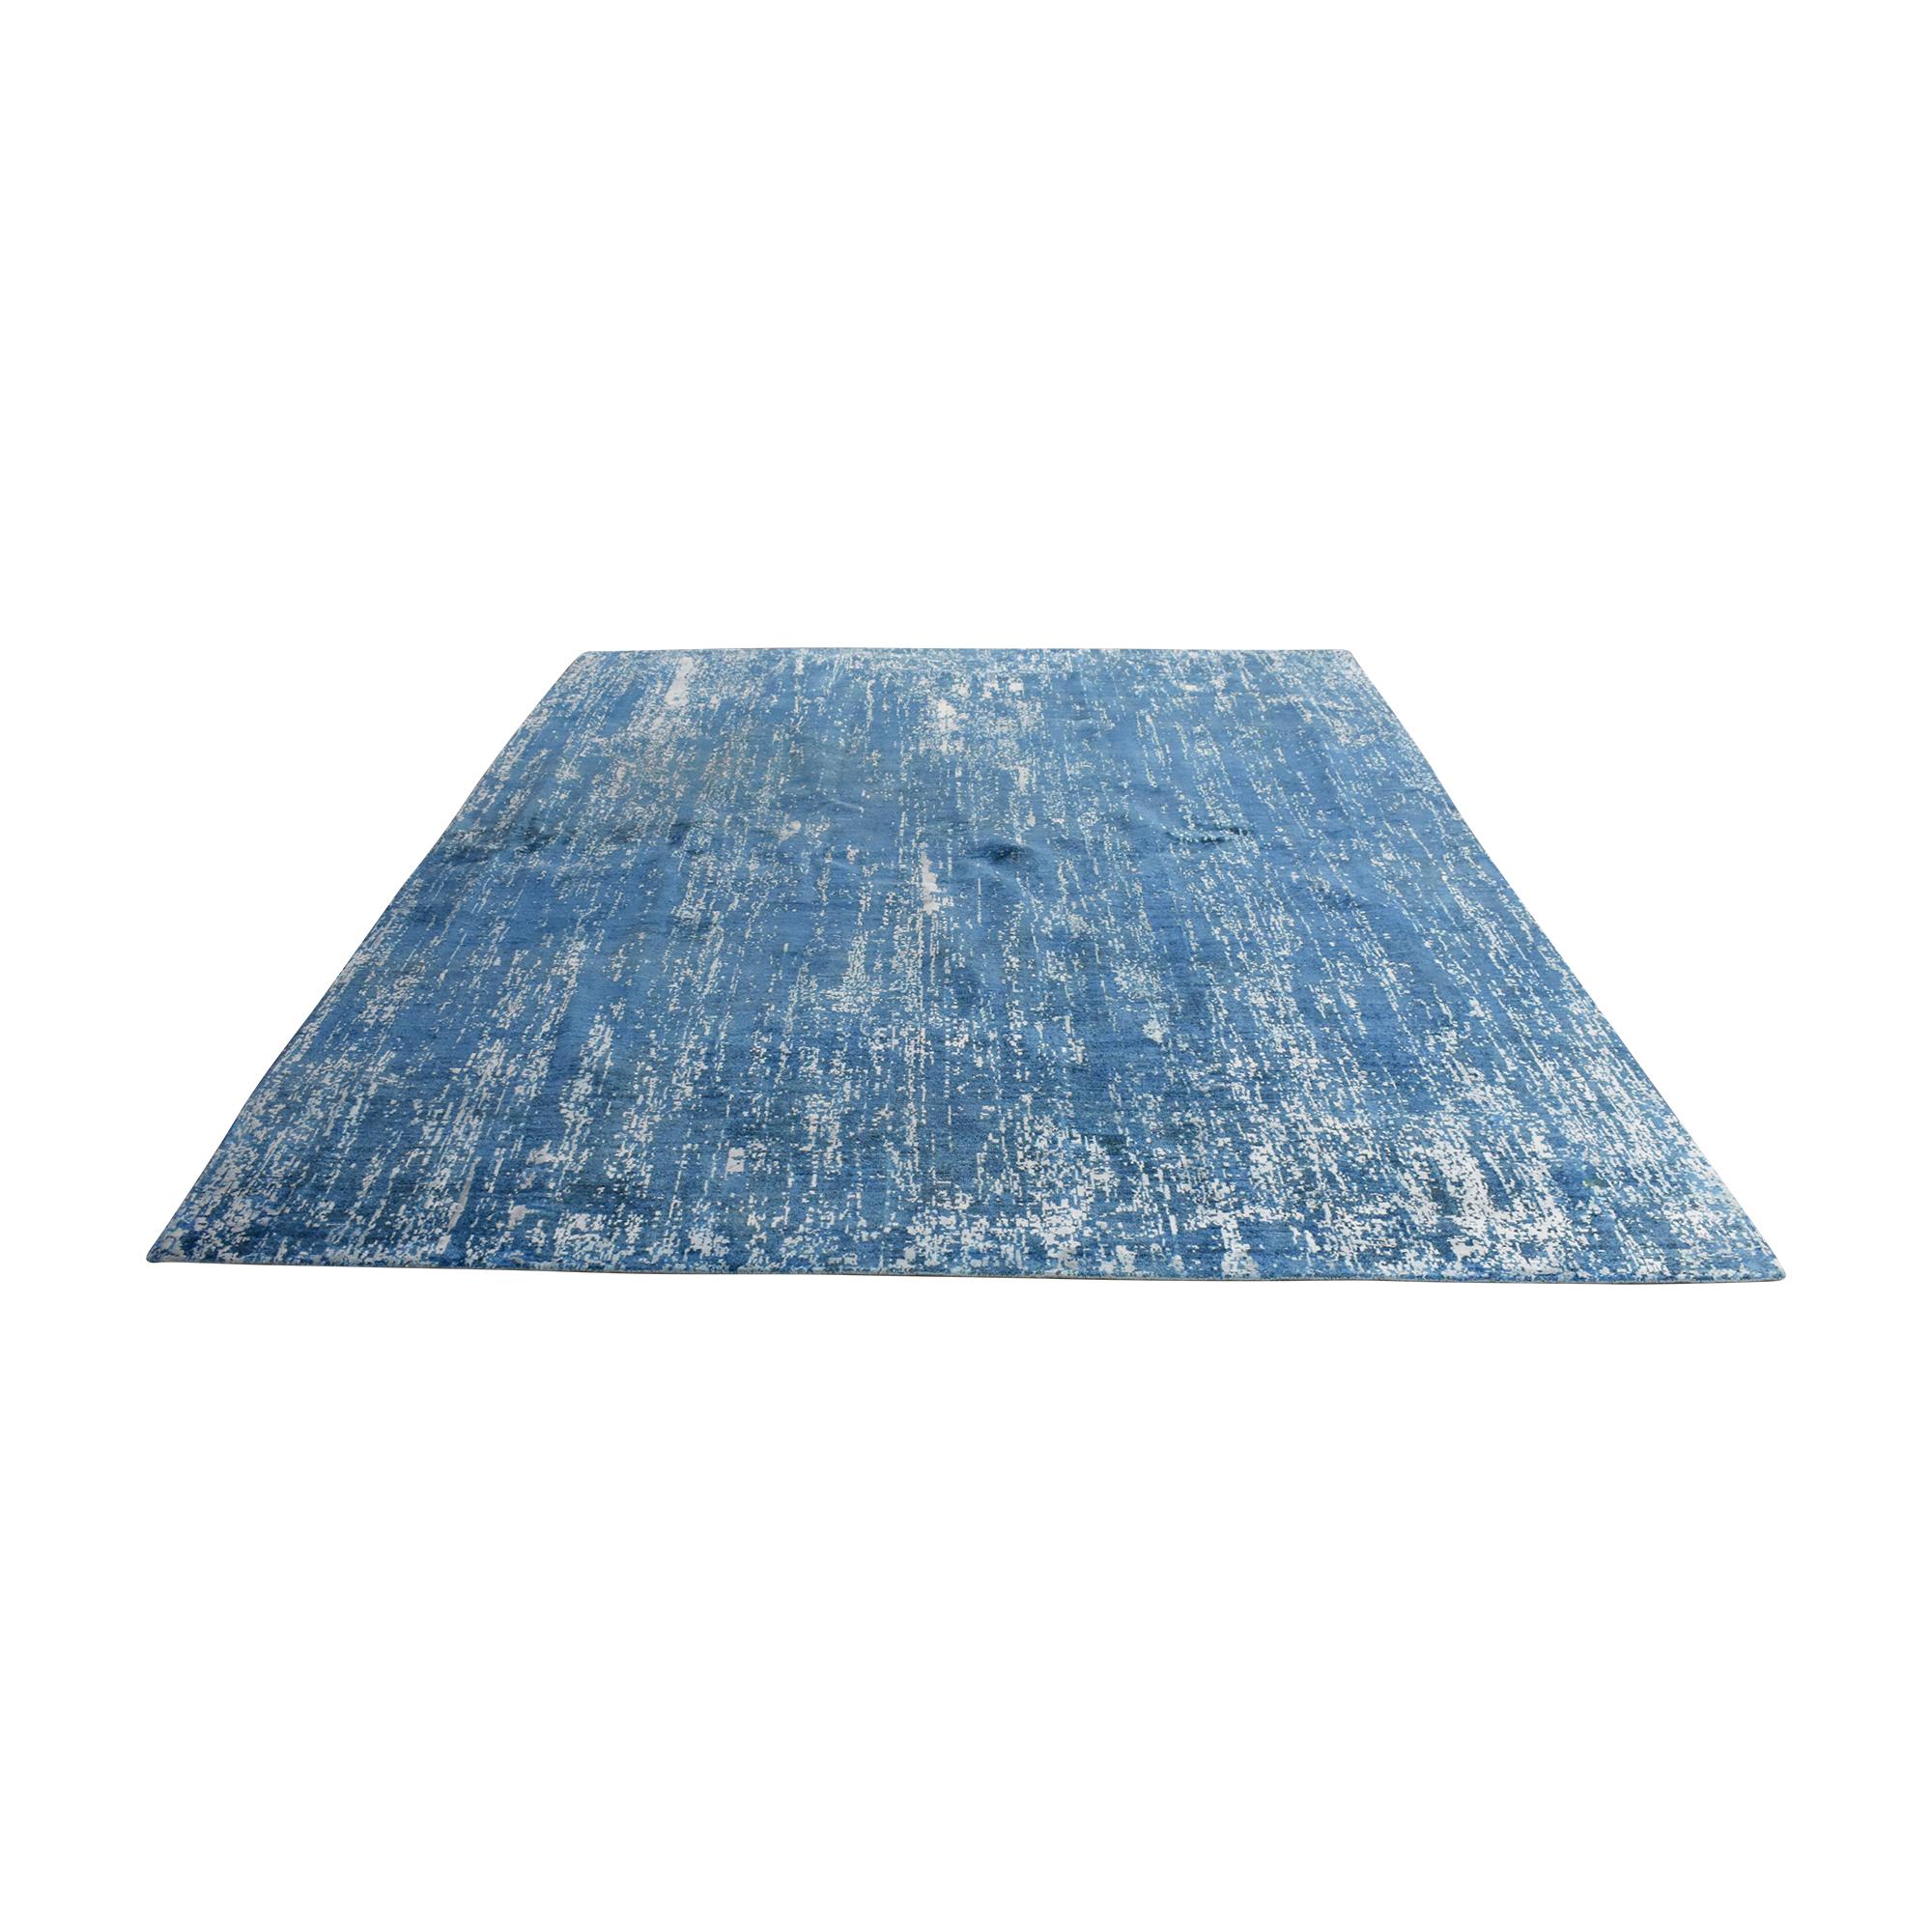 ABC Carpet & Home Modern Area Rug / Rugs